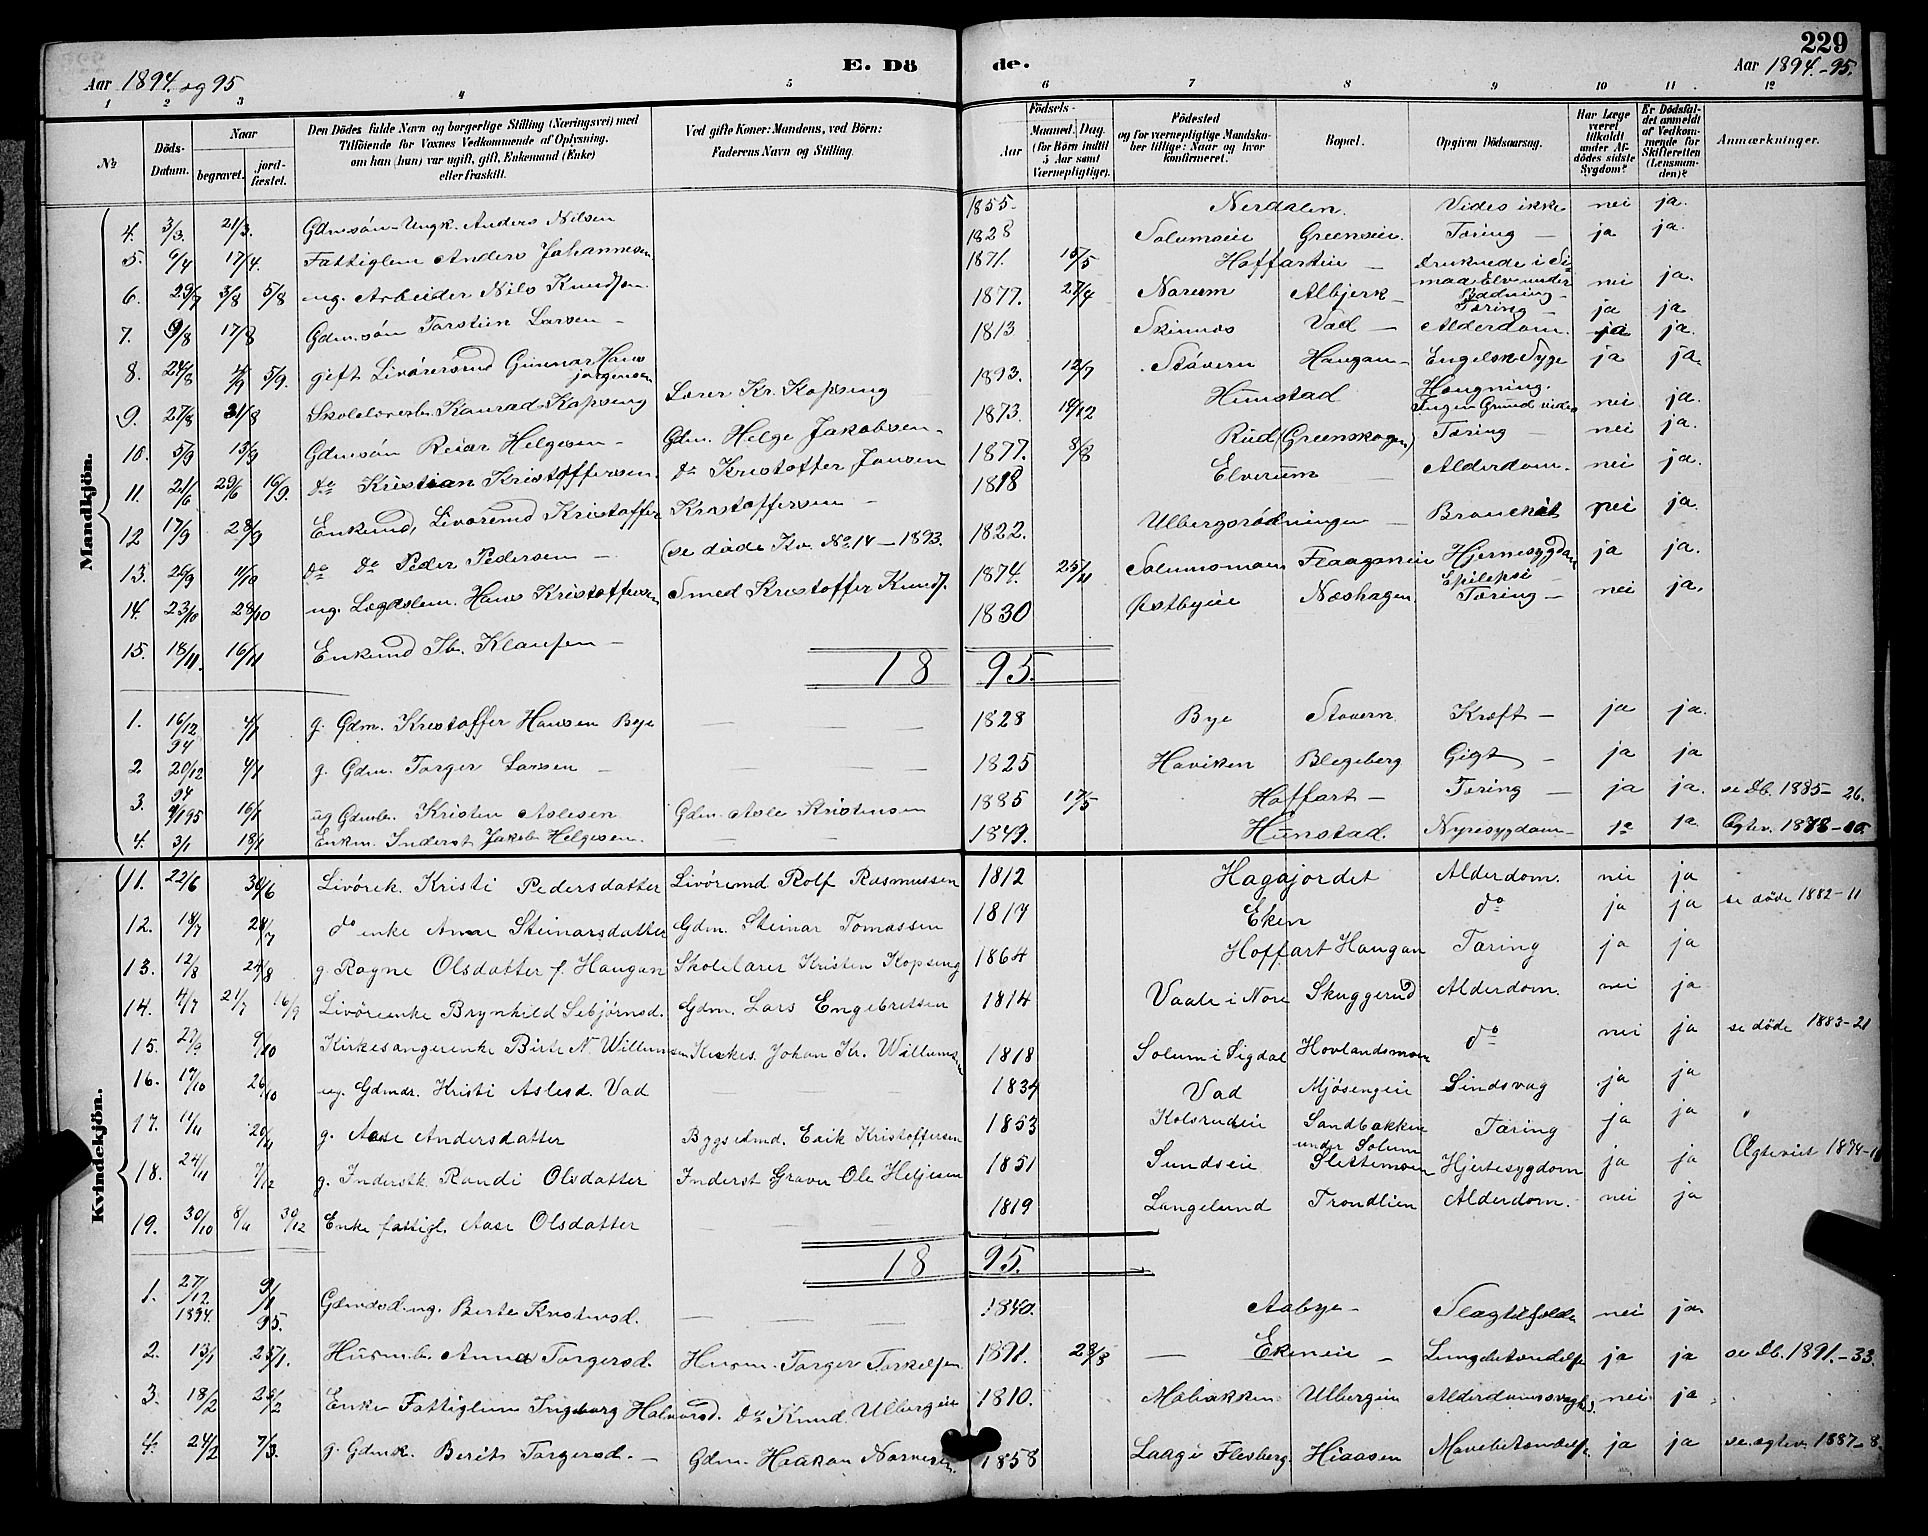 SAKO, Sigdal kirkebøker, G/Ga/L0005: Klokkerbok nr. I 5, 1886-1900, s. 229